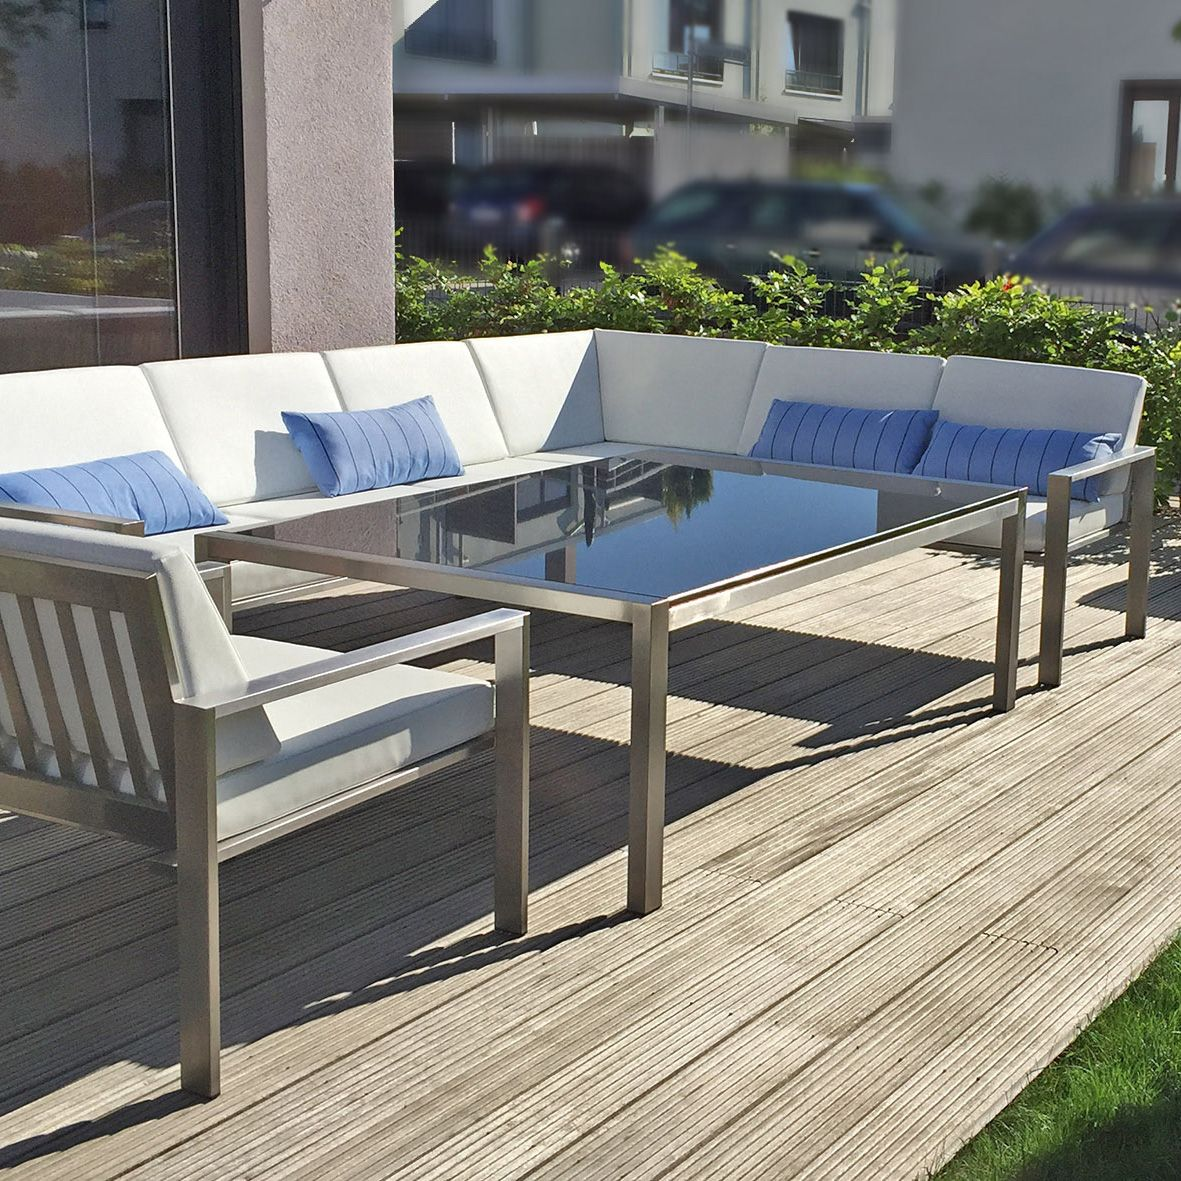 Siena Garden Lounge Set Pescara Bronze Aluminium X2f Geflecht